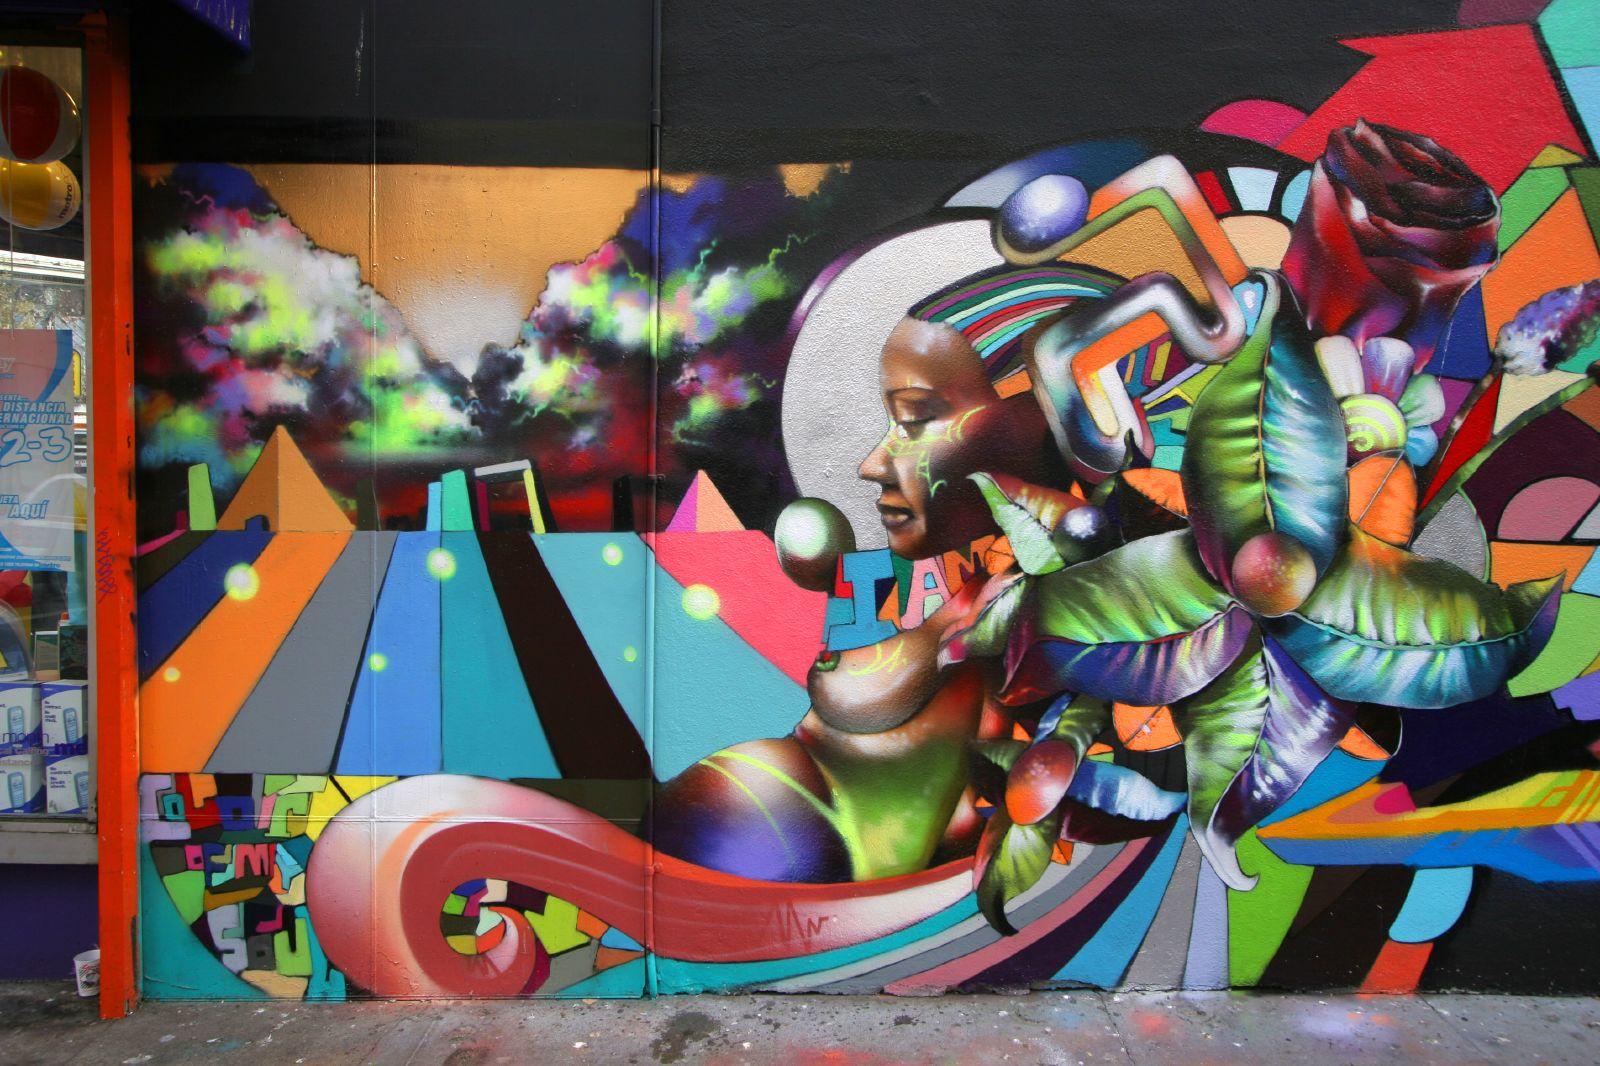 Street art by chor boogie san francisco ca